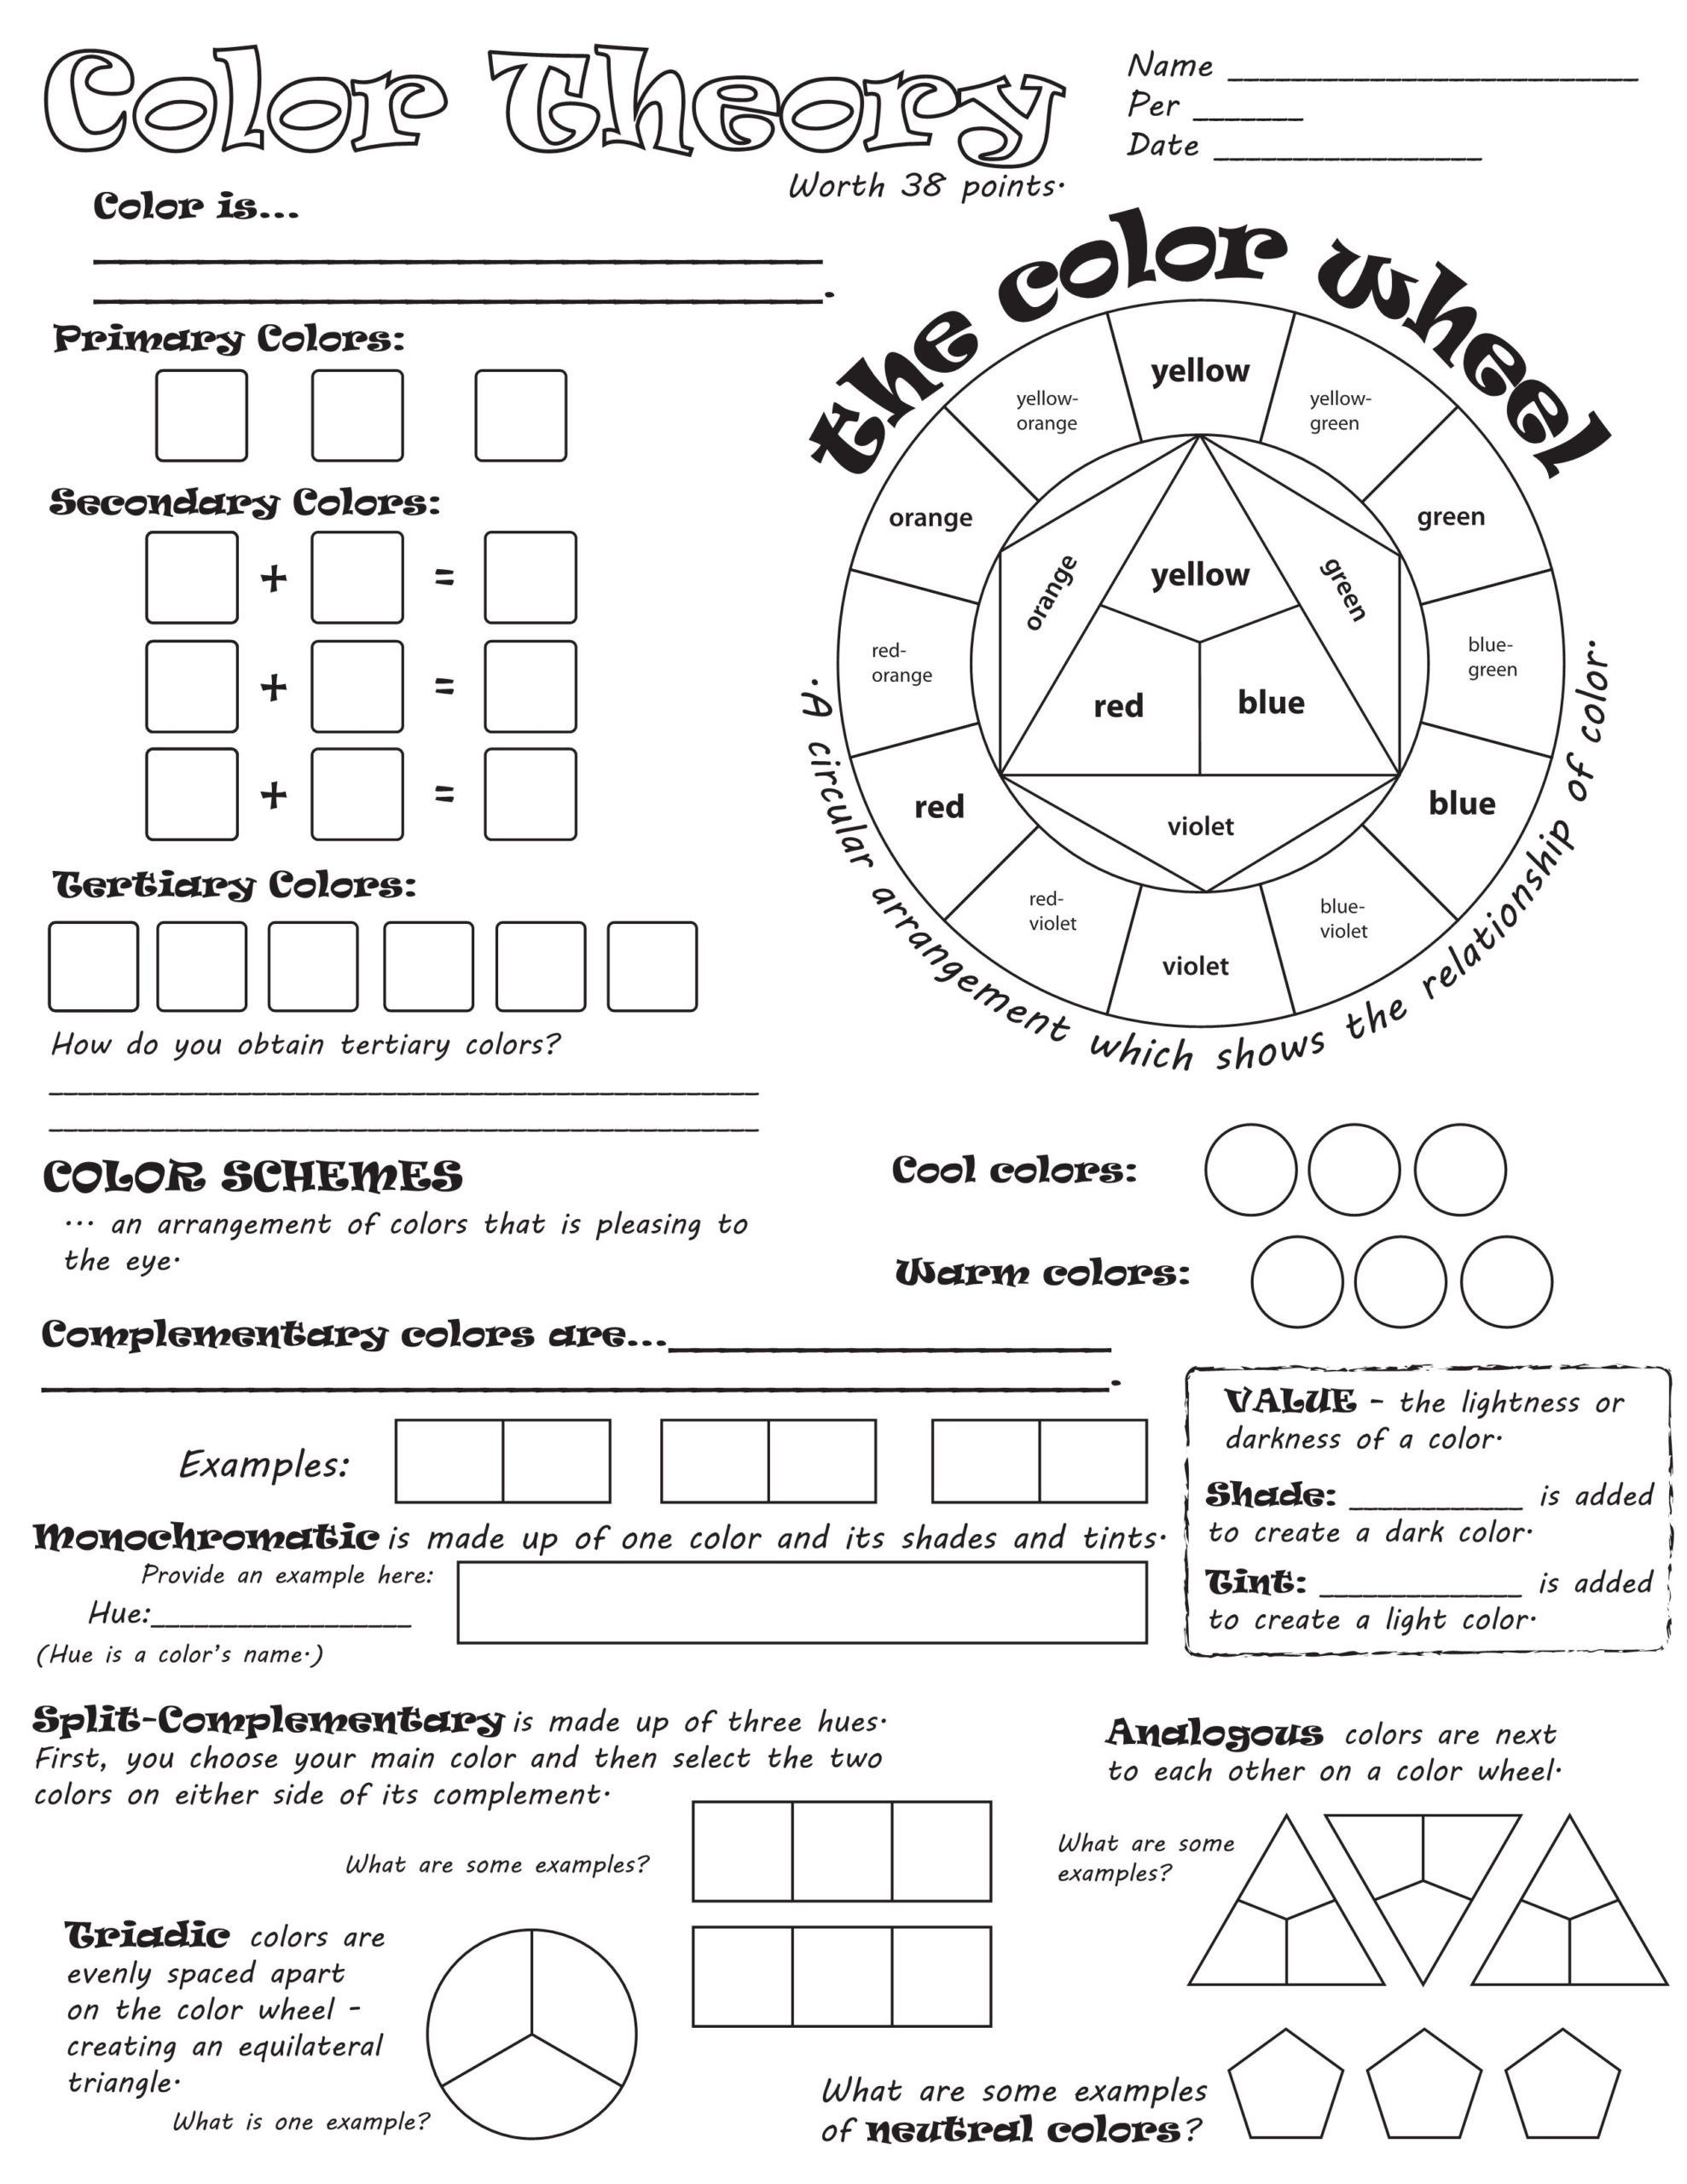 5 Worksheet Grade Math Worksheets Equation Worksheet Time Ks2 Powerpoint Advanced 2nd Grade M Art Worksheets Art Education Lessons Color Theory Worksheet